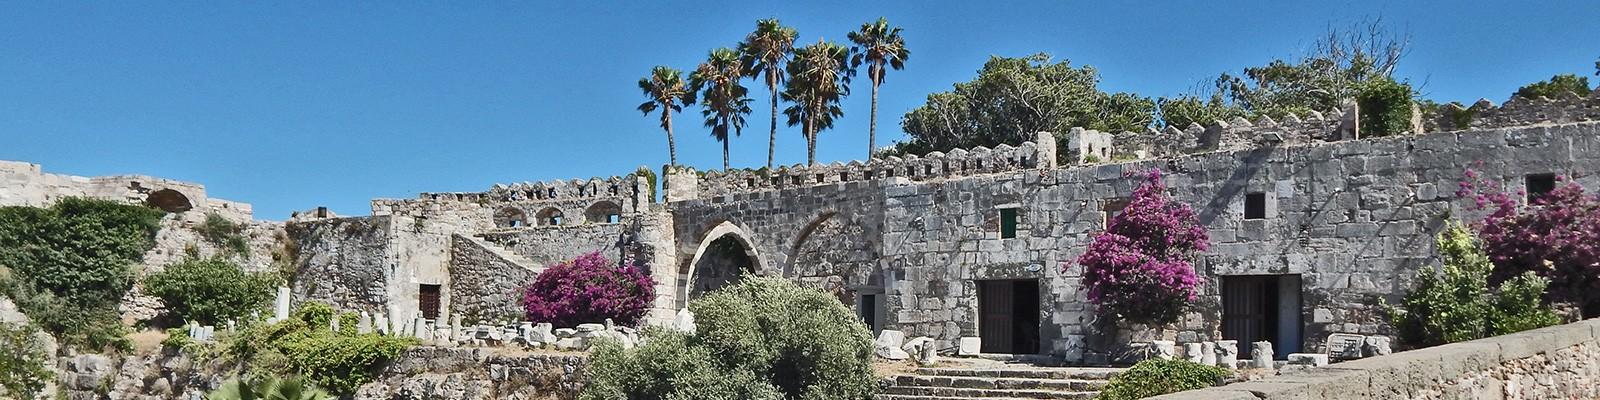 History of Kos Island